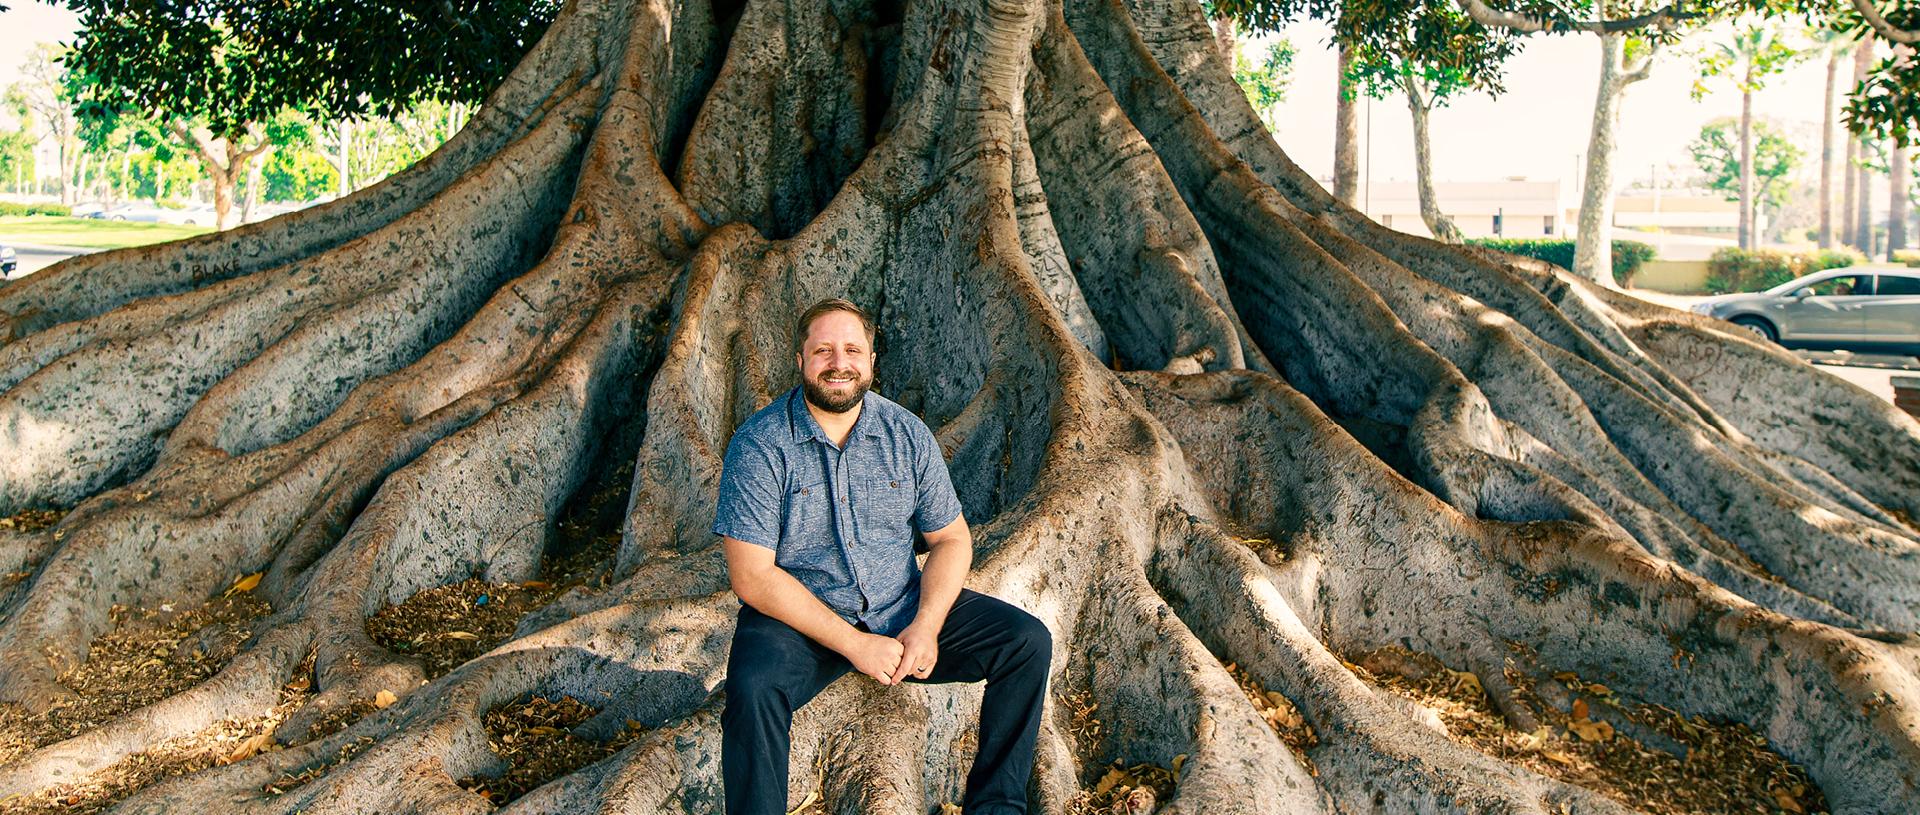 man sitting on roots